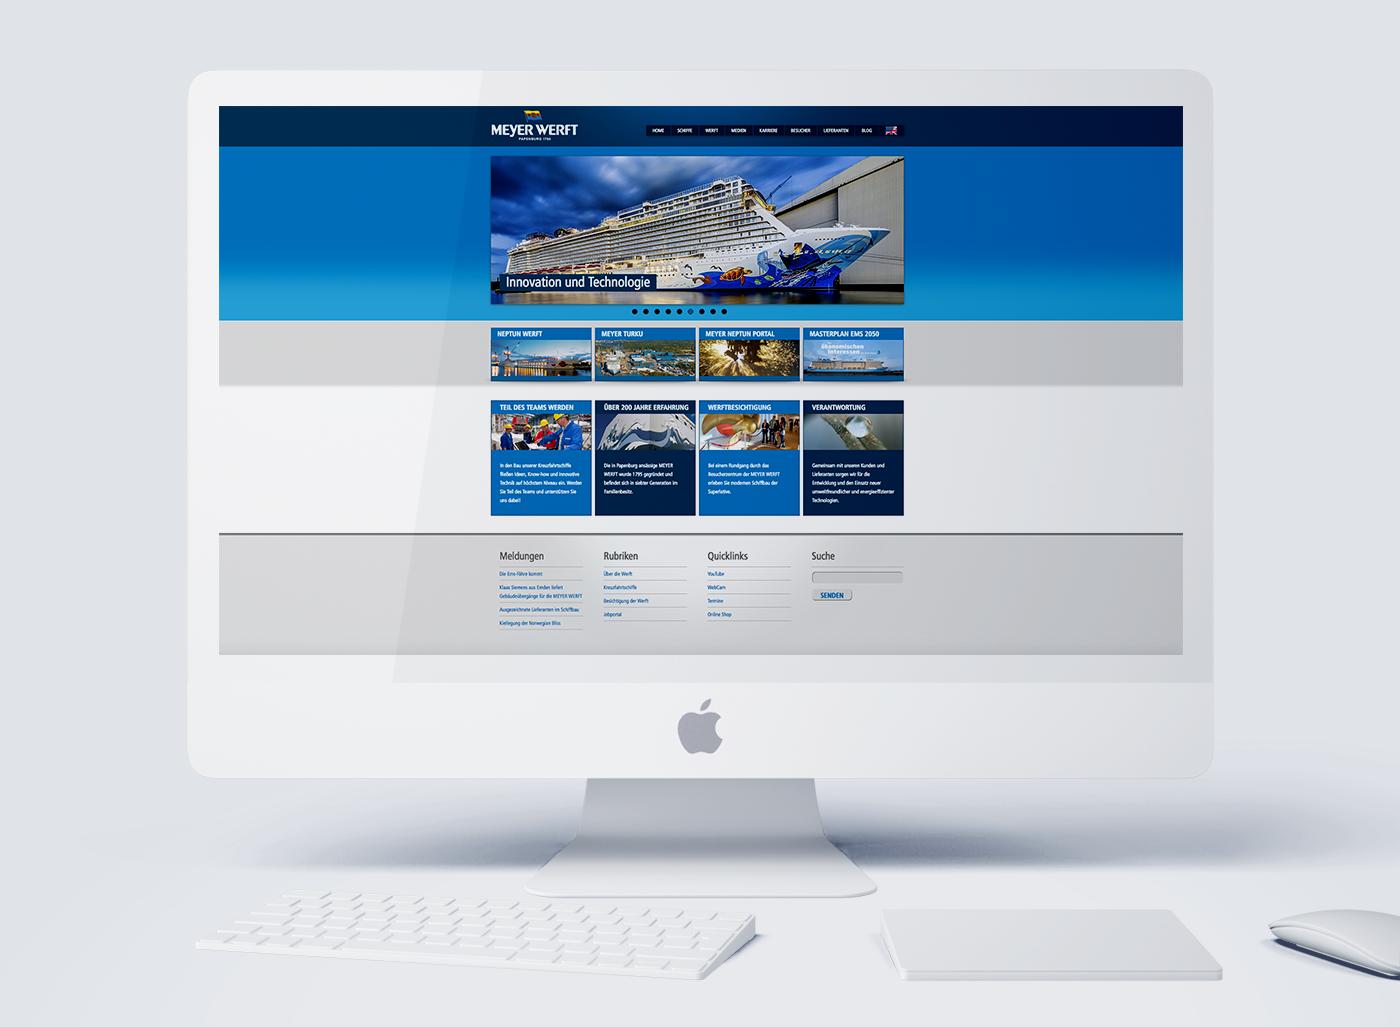 eskalade Meyer Werft Internet